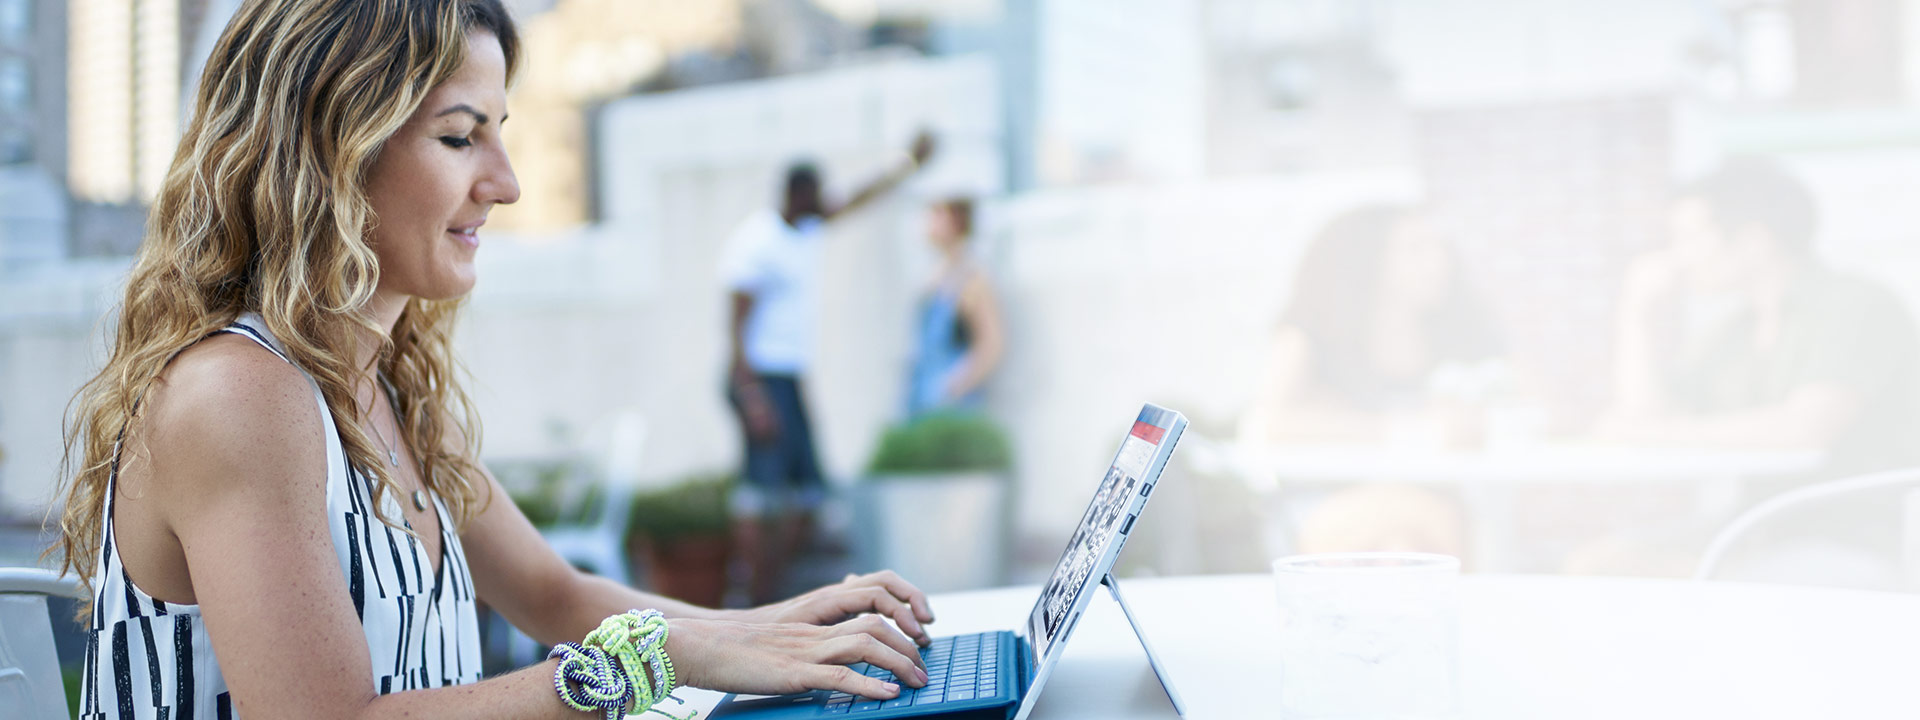 A man using a Surface Book